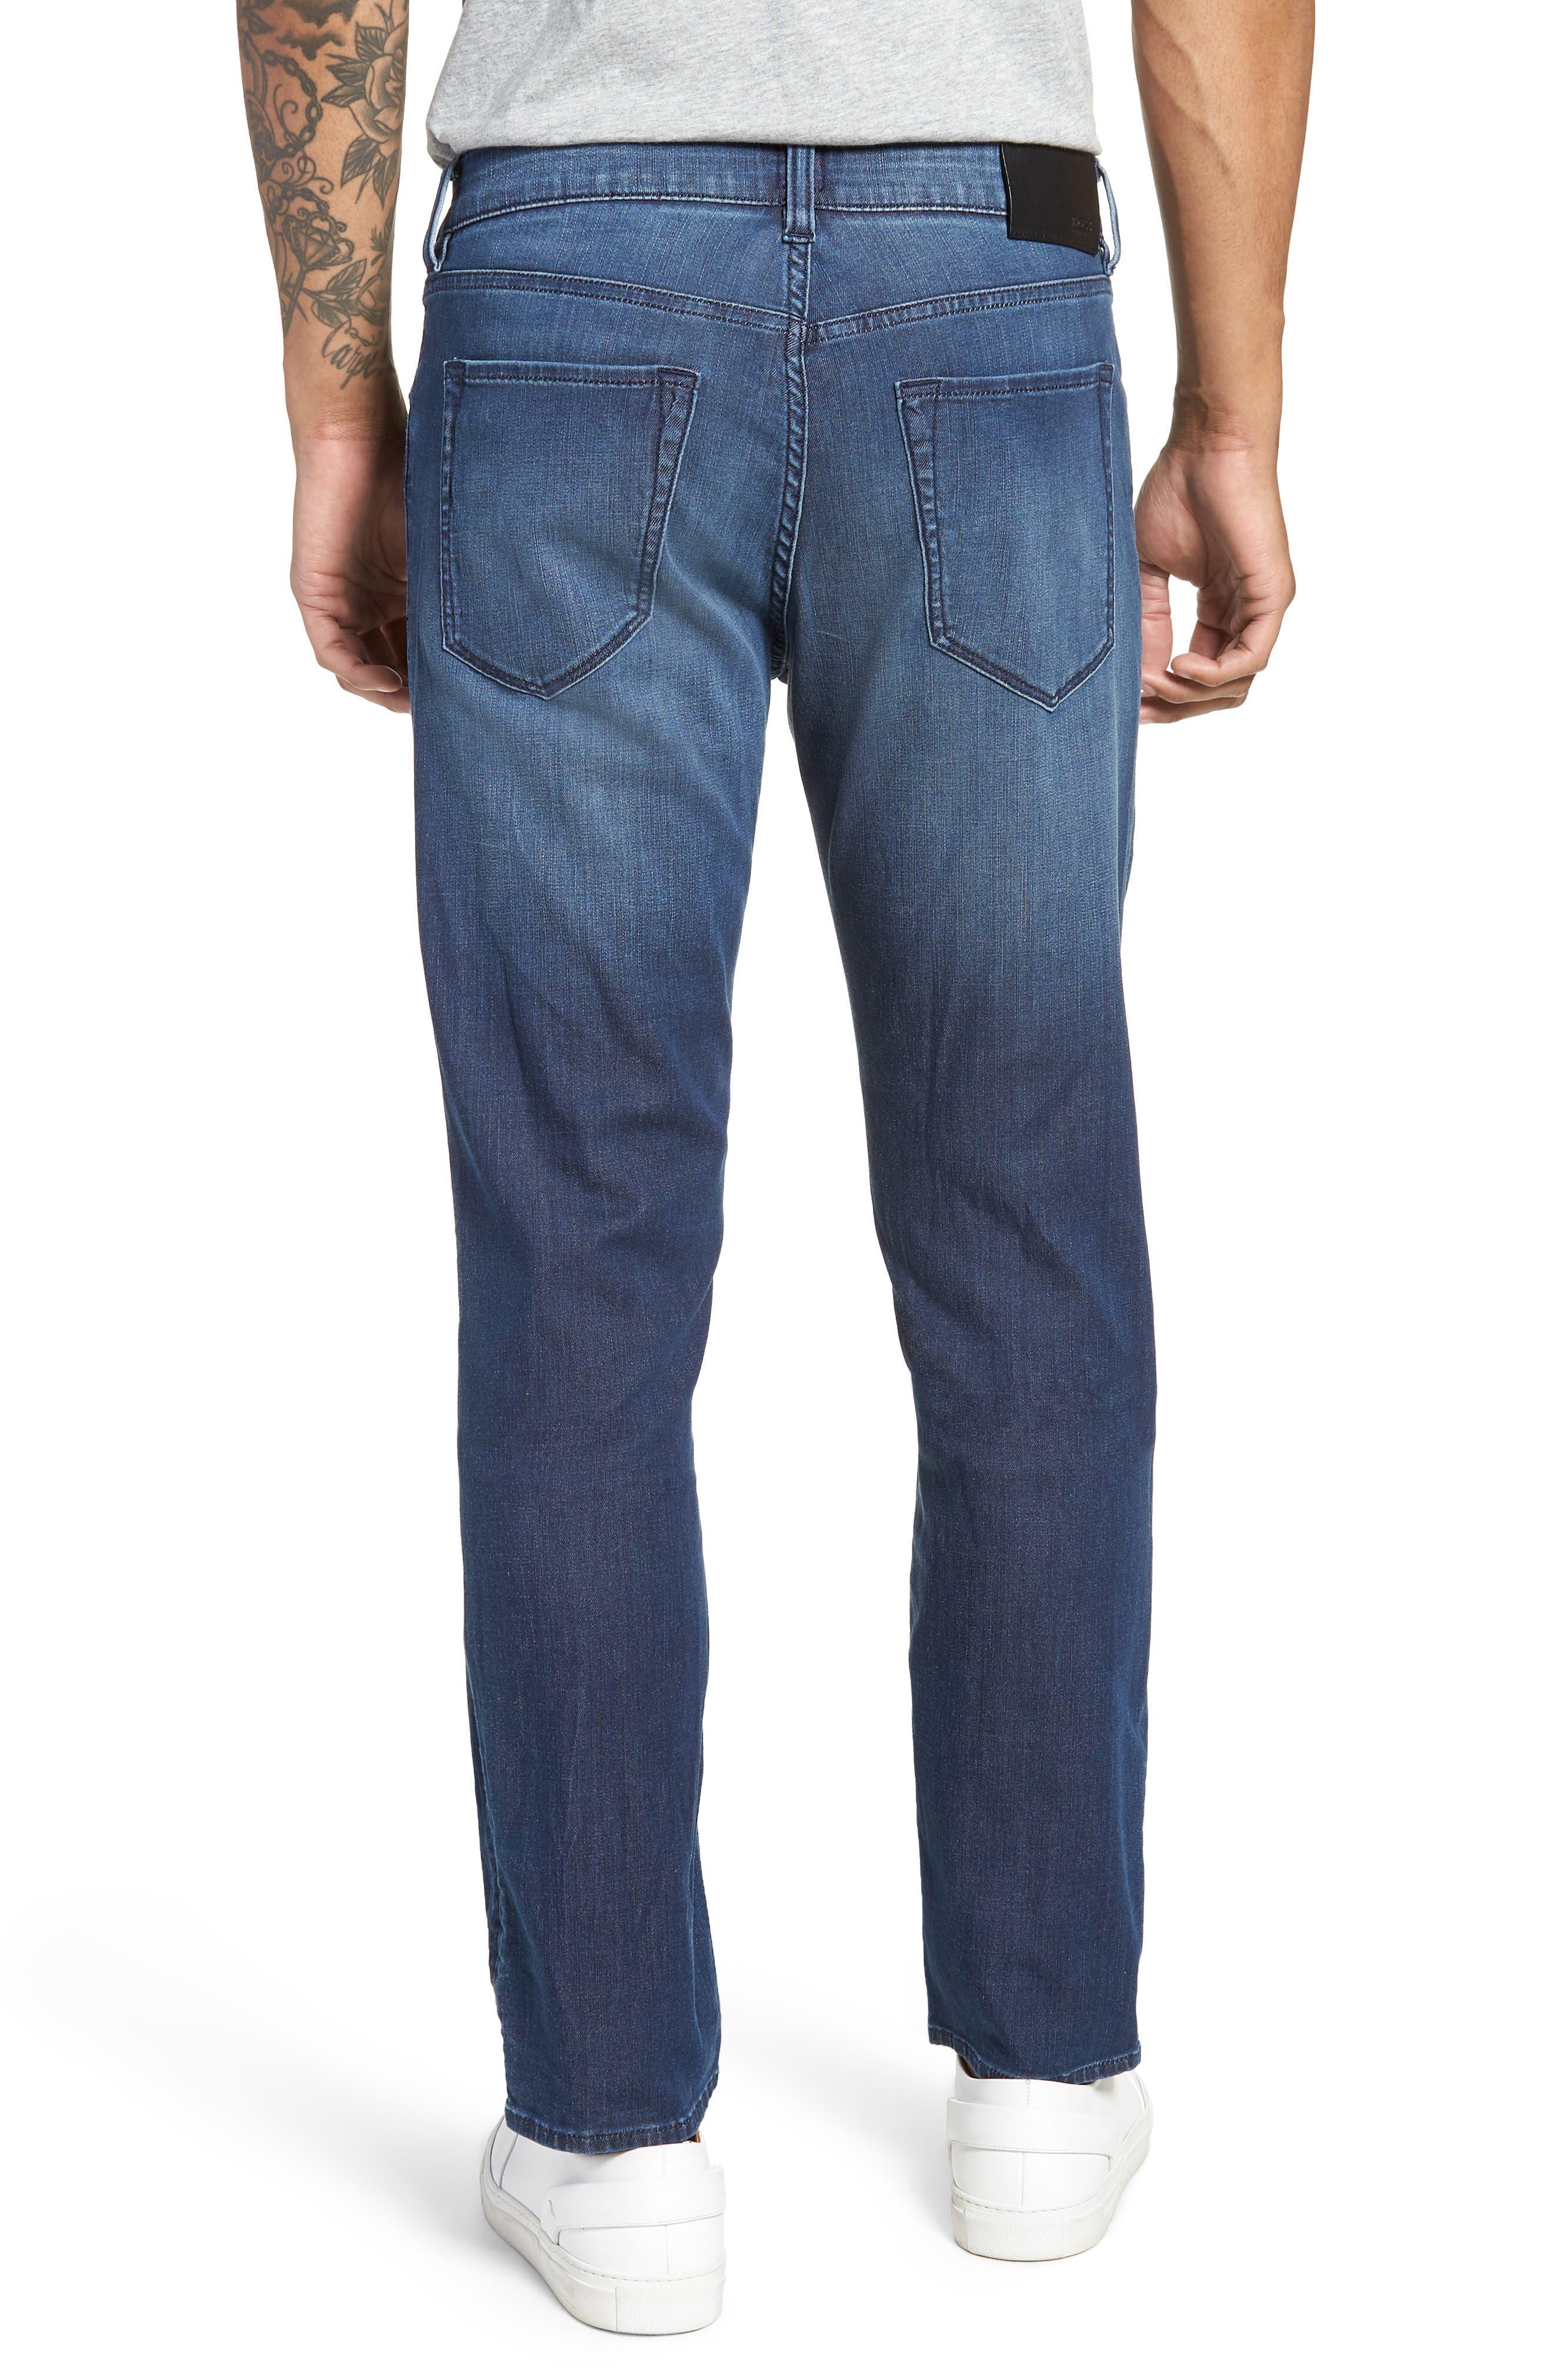 Maine Straight Leg Jeans,                             Alternate thumbnail 2, color,                             Blue